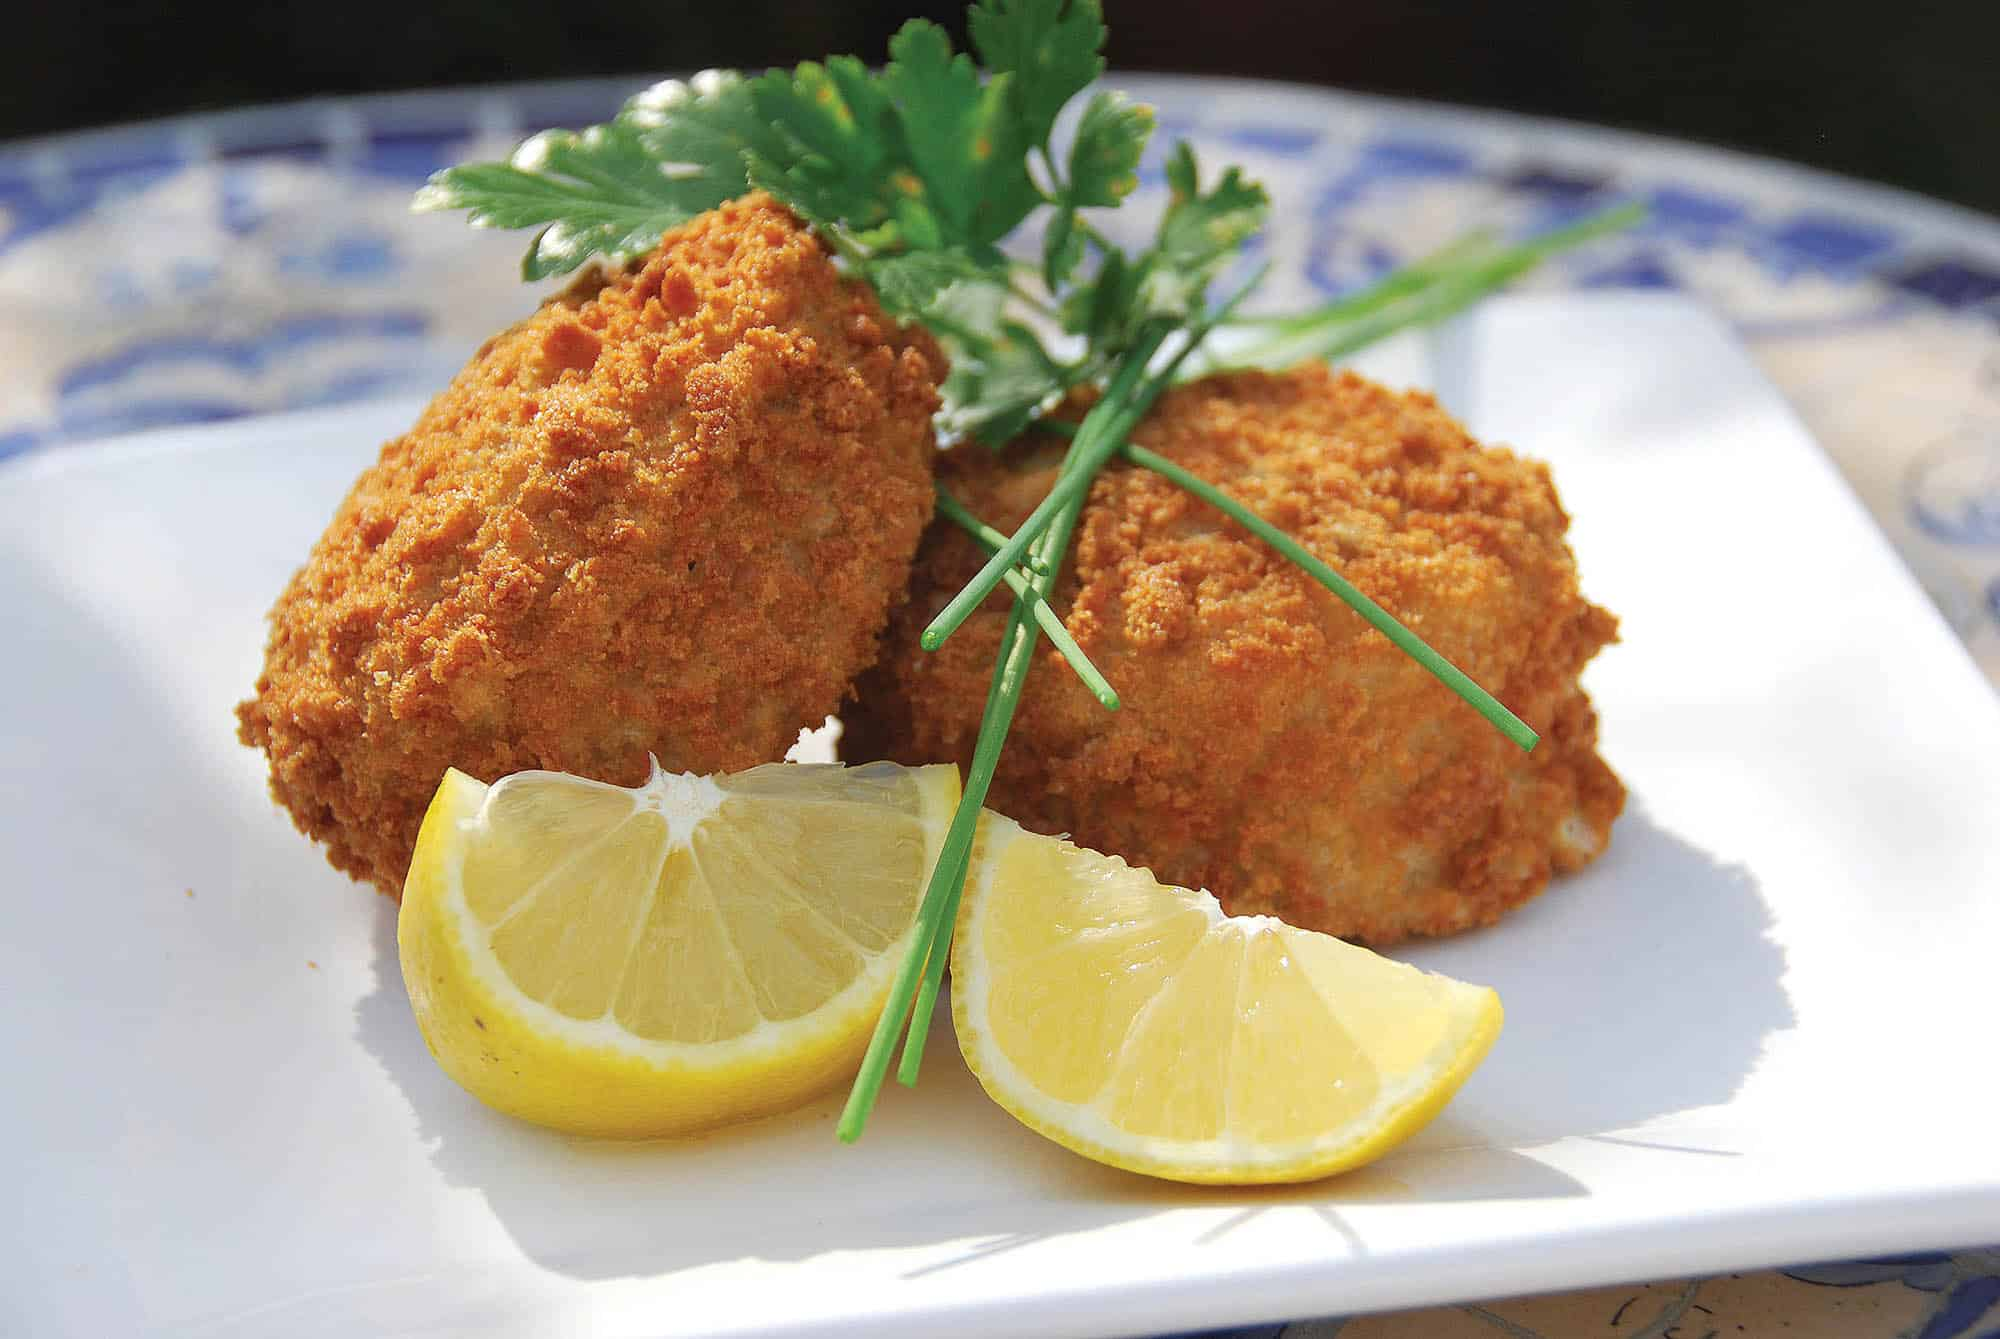 DJHDP4 Fish cakes, creamy cod and parsley fish cakes with fresh lemon